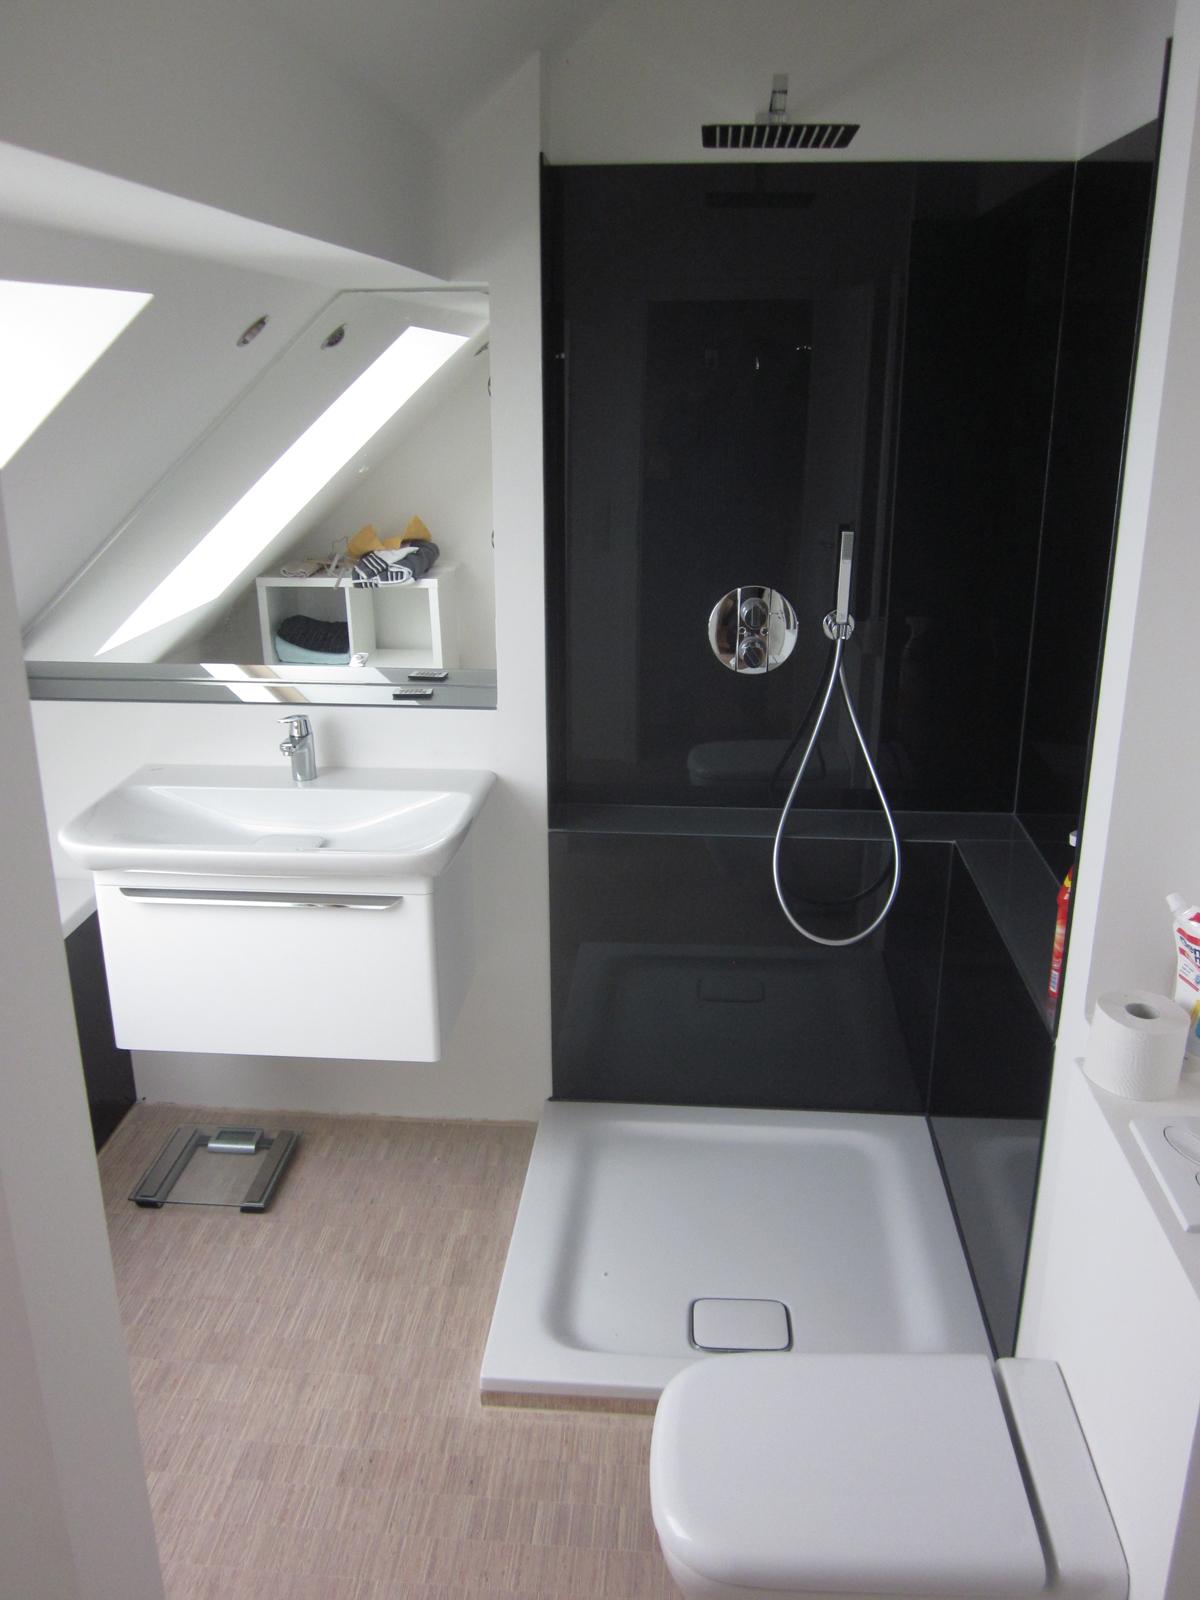 bauwerk parkett parkett im bad bauwerk parkett wohngesunde parkett f r badezimmer. Black Bedroom Furniture Sets. Home Design Ideas